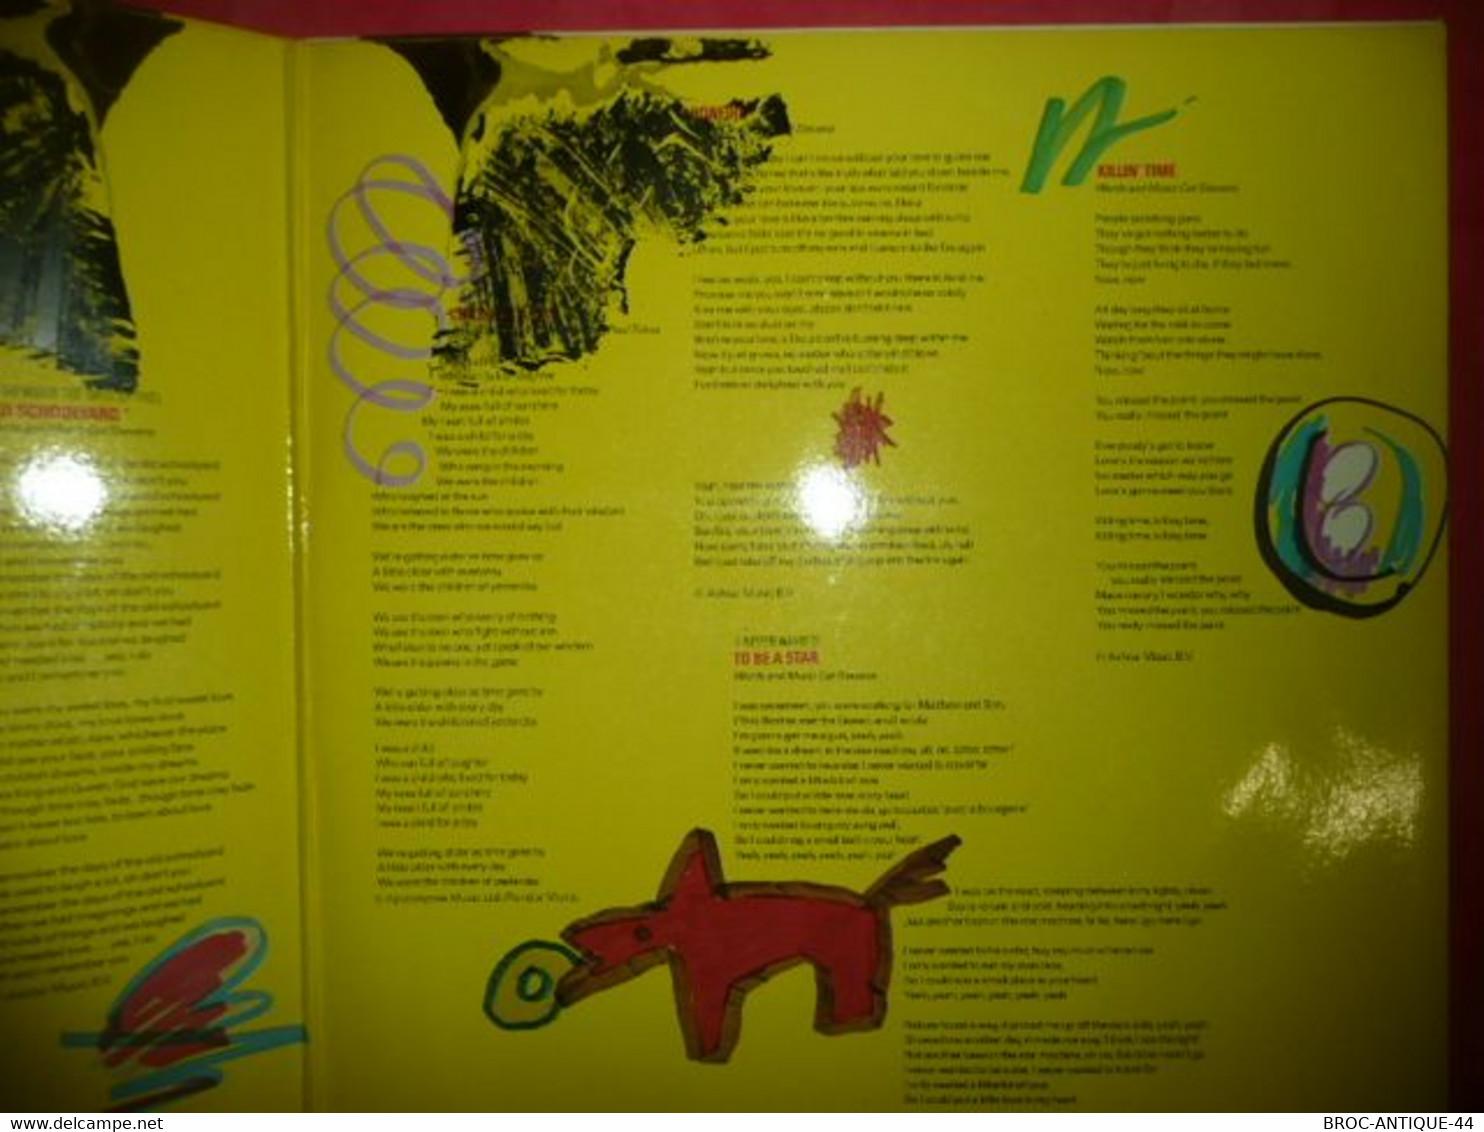 LP33 N°7075 - CAT STEVENS - 9101 676 - Y - POP ROCK - Rock